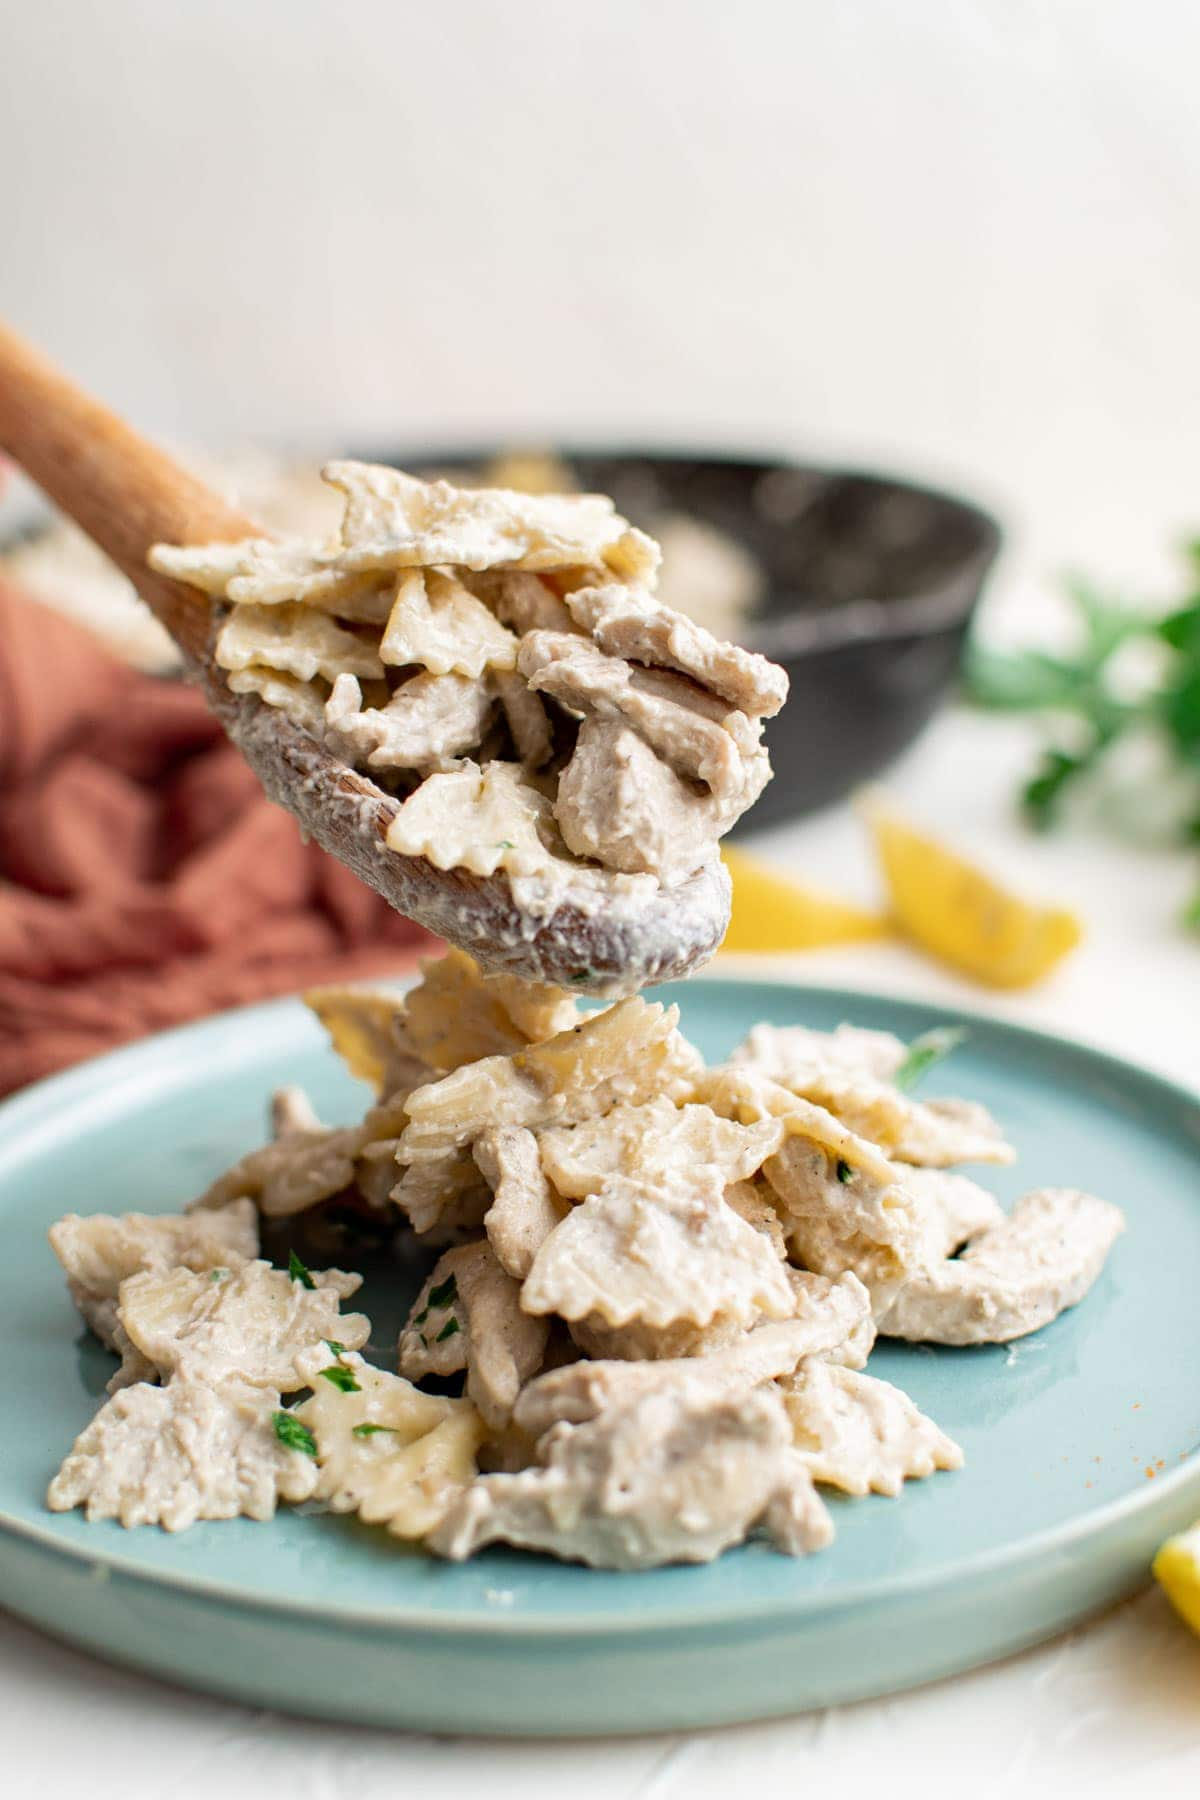 creamy chicken pasta, lemons, wooden spoon